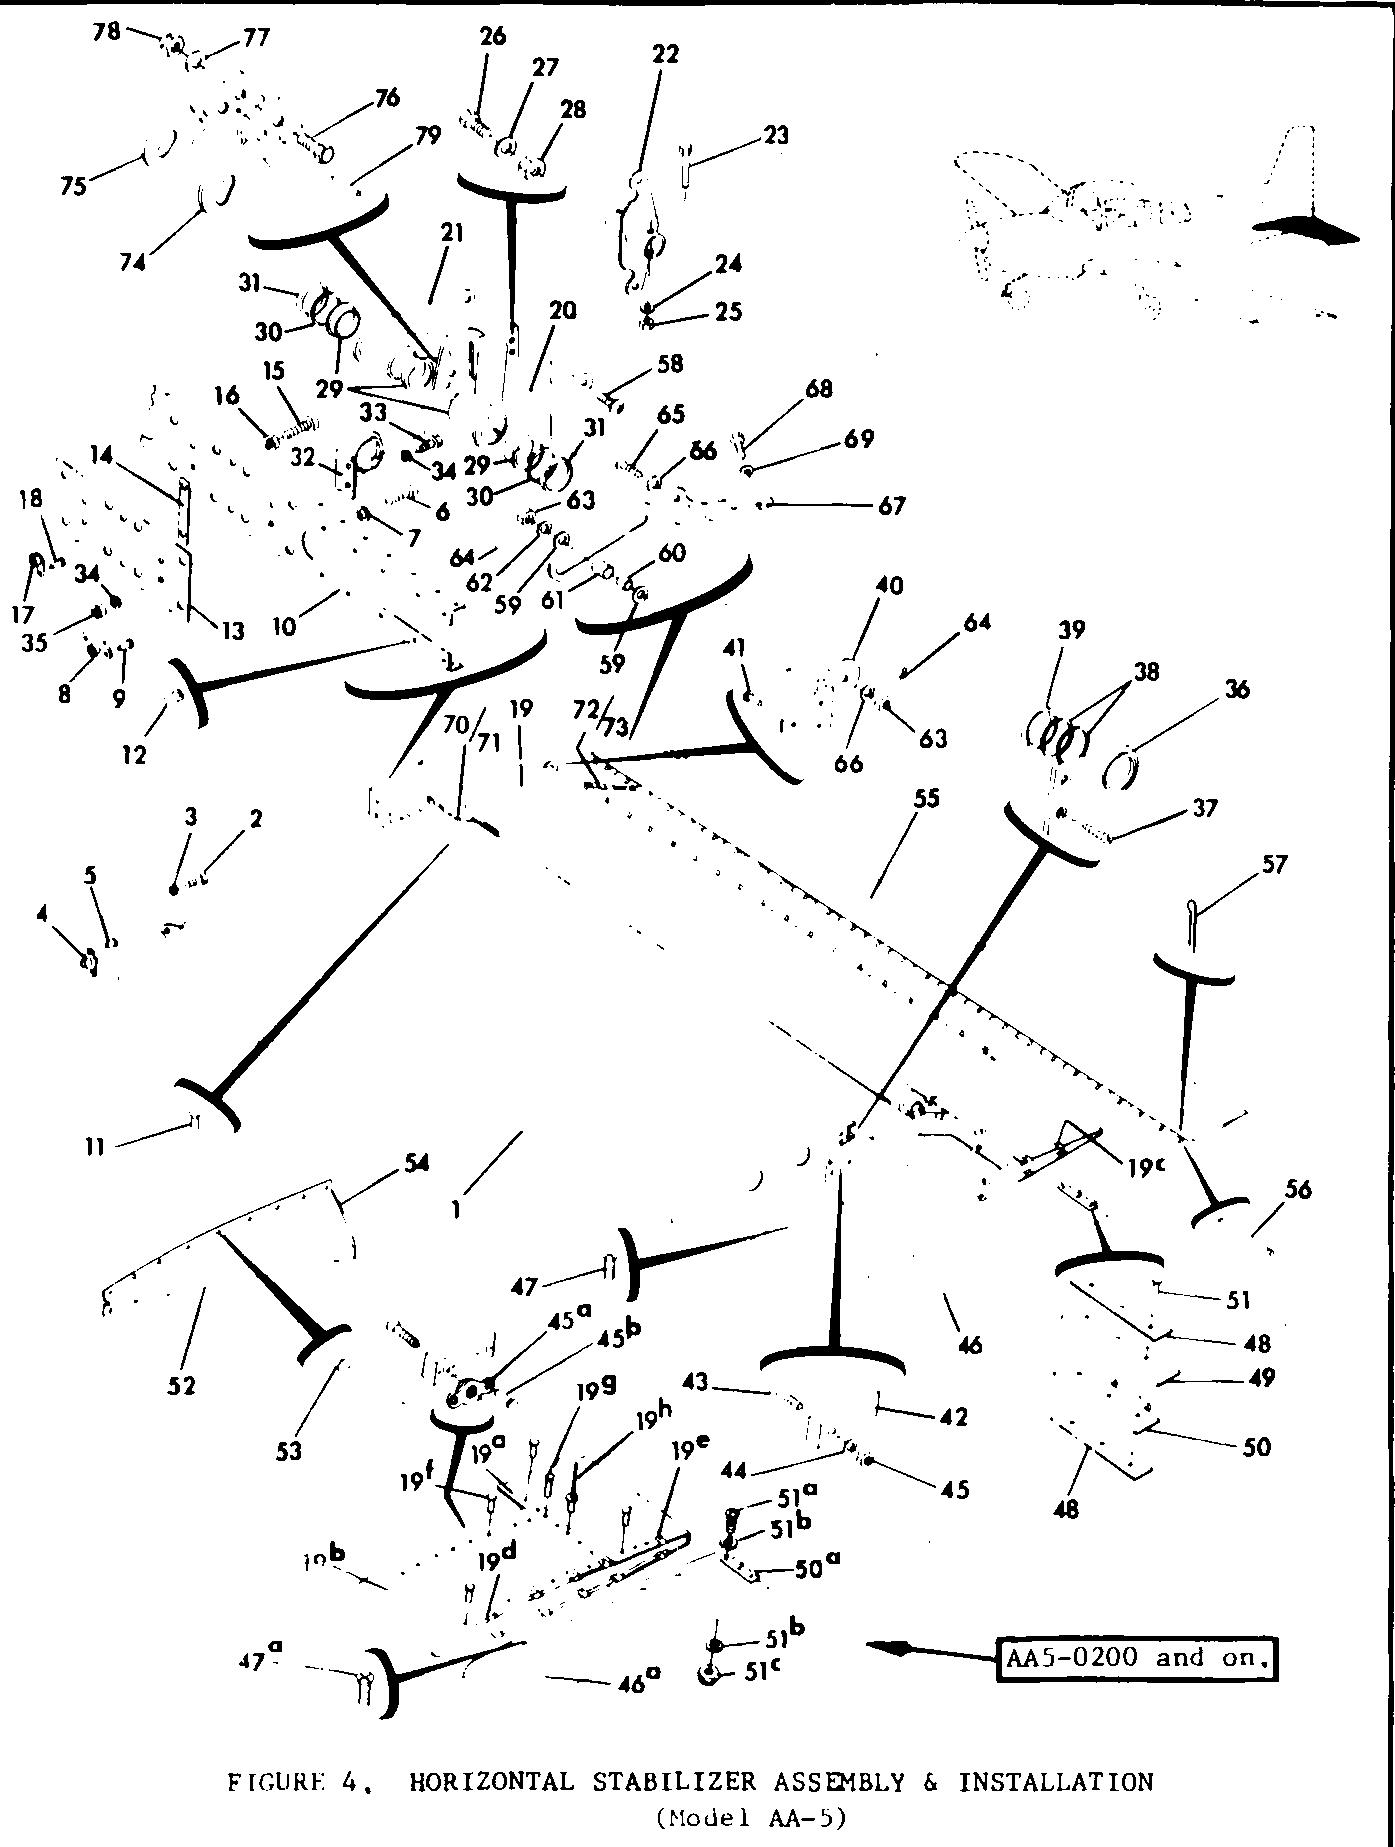 Parts-Diagram-Figure-4-Horizontal-Stabilizer-Model-AA5